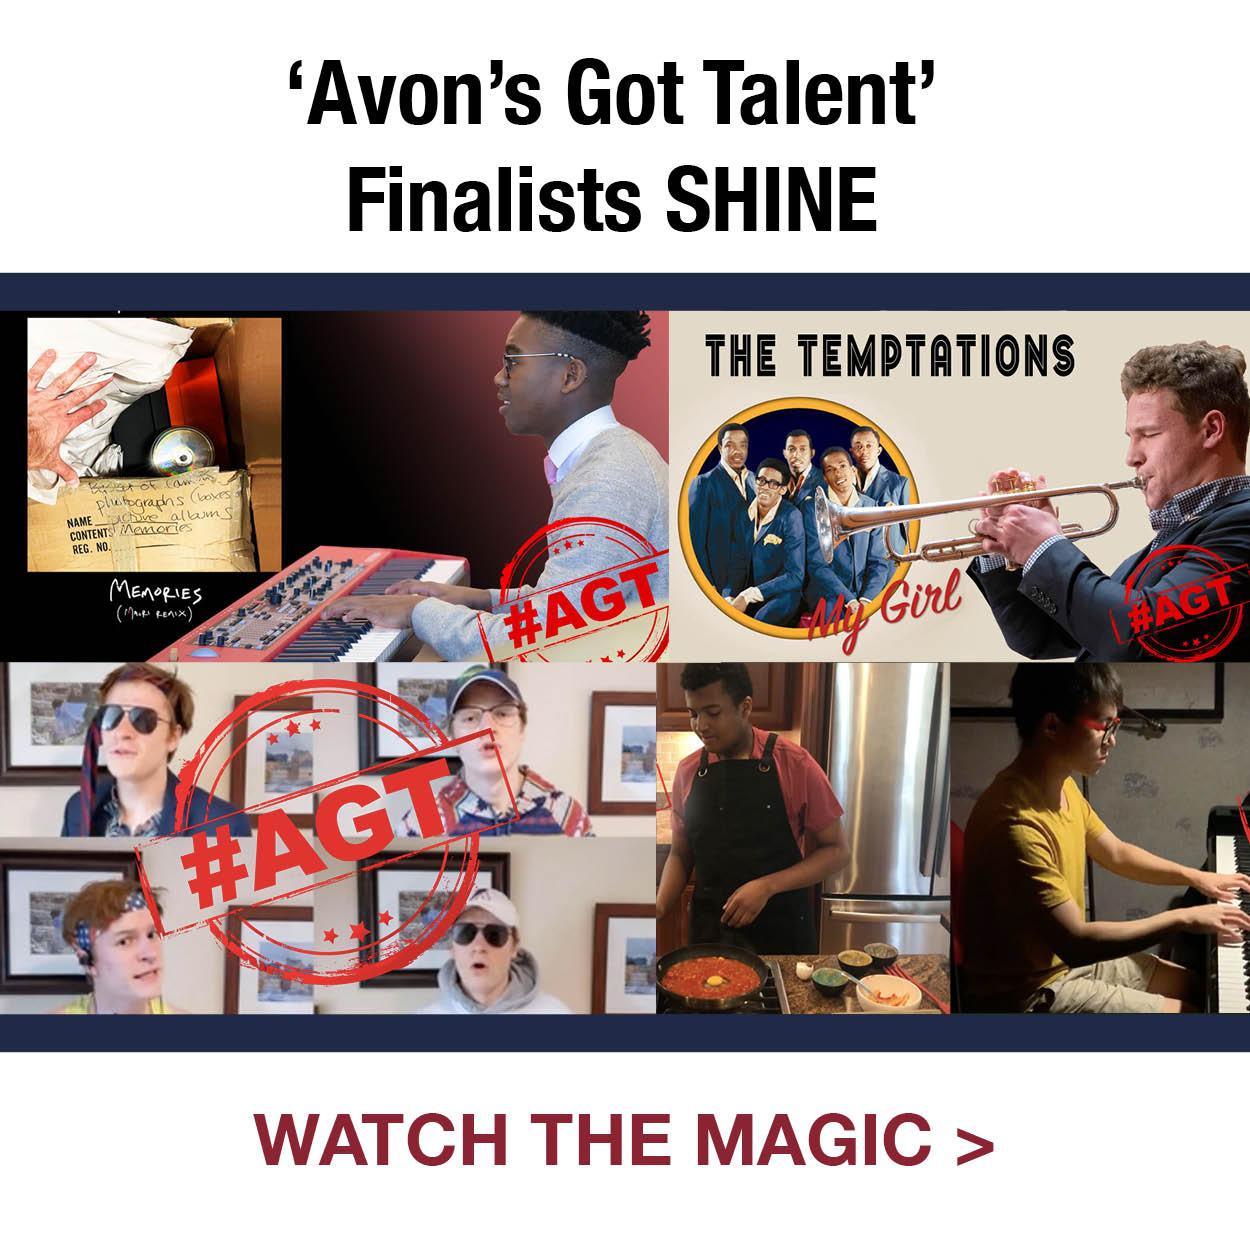 Avon's Got Talent